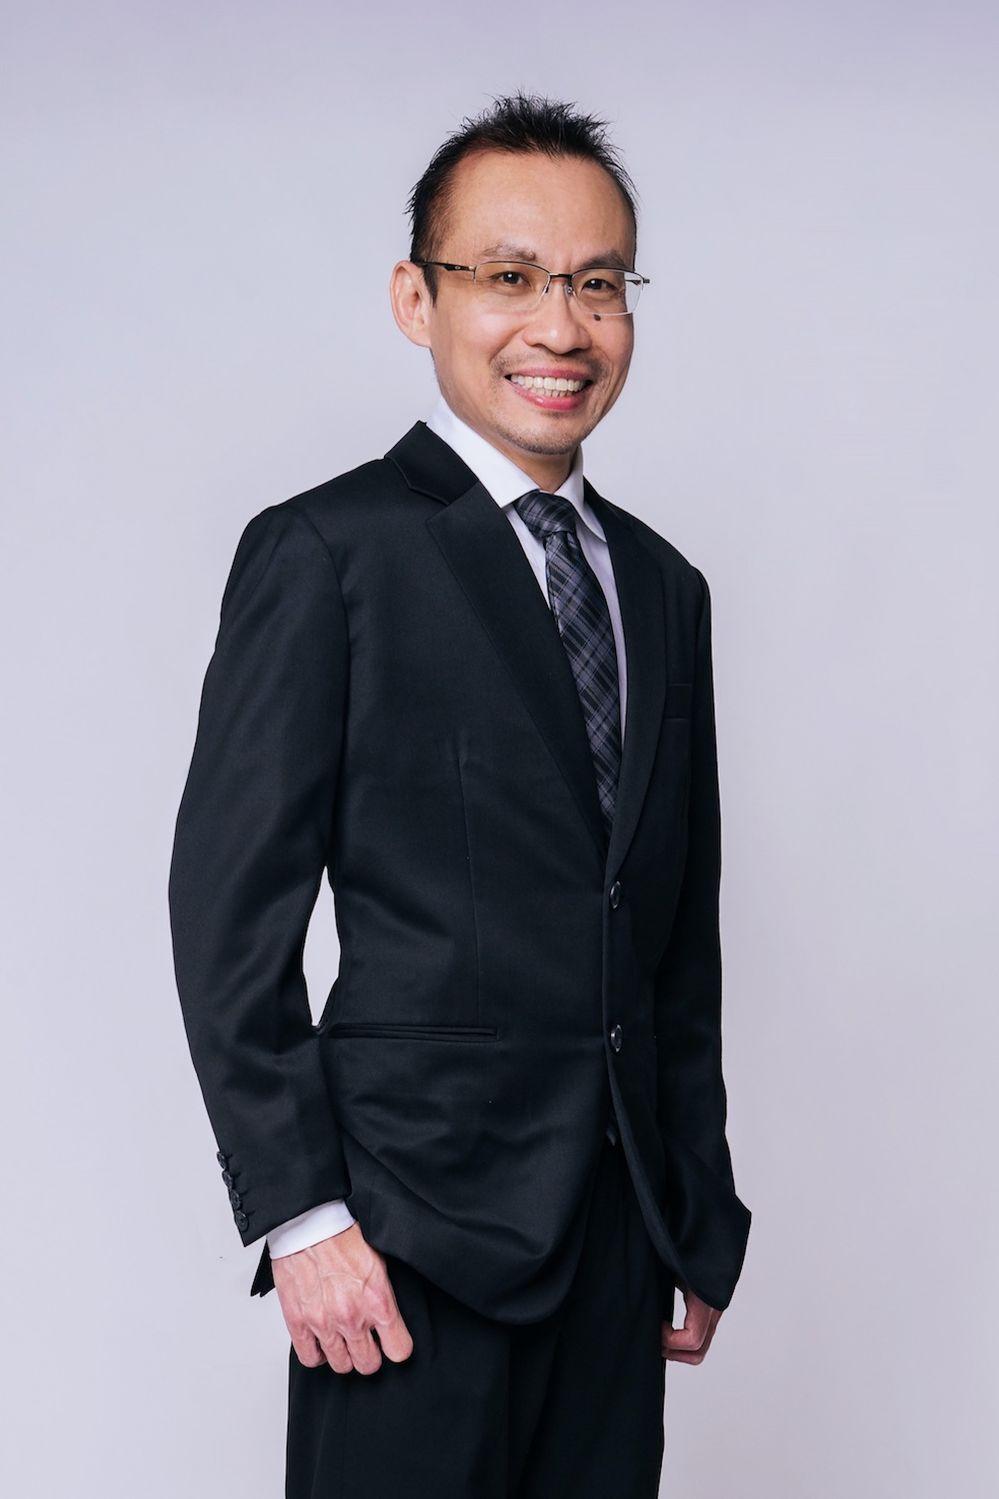 Leonard-Tay - EDGEPROP SINGAPORE